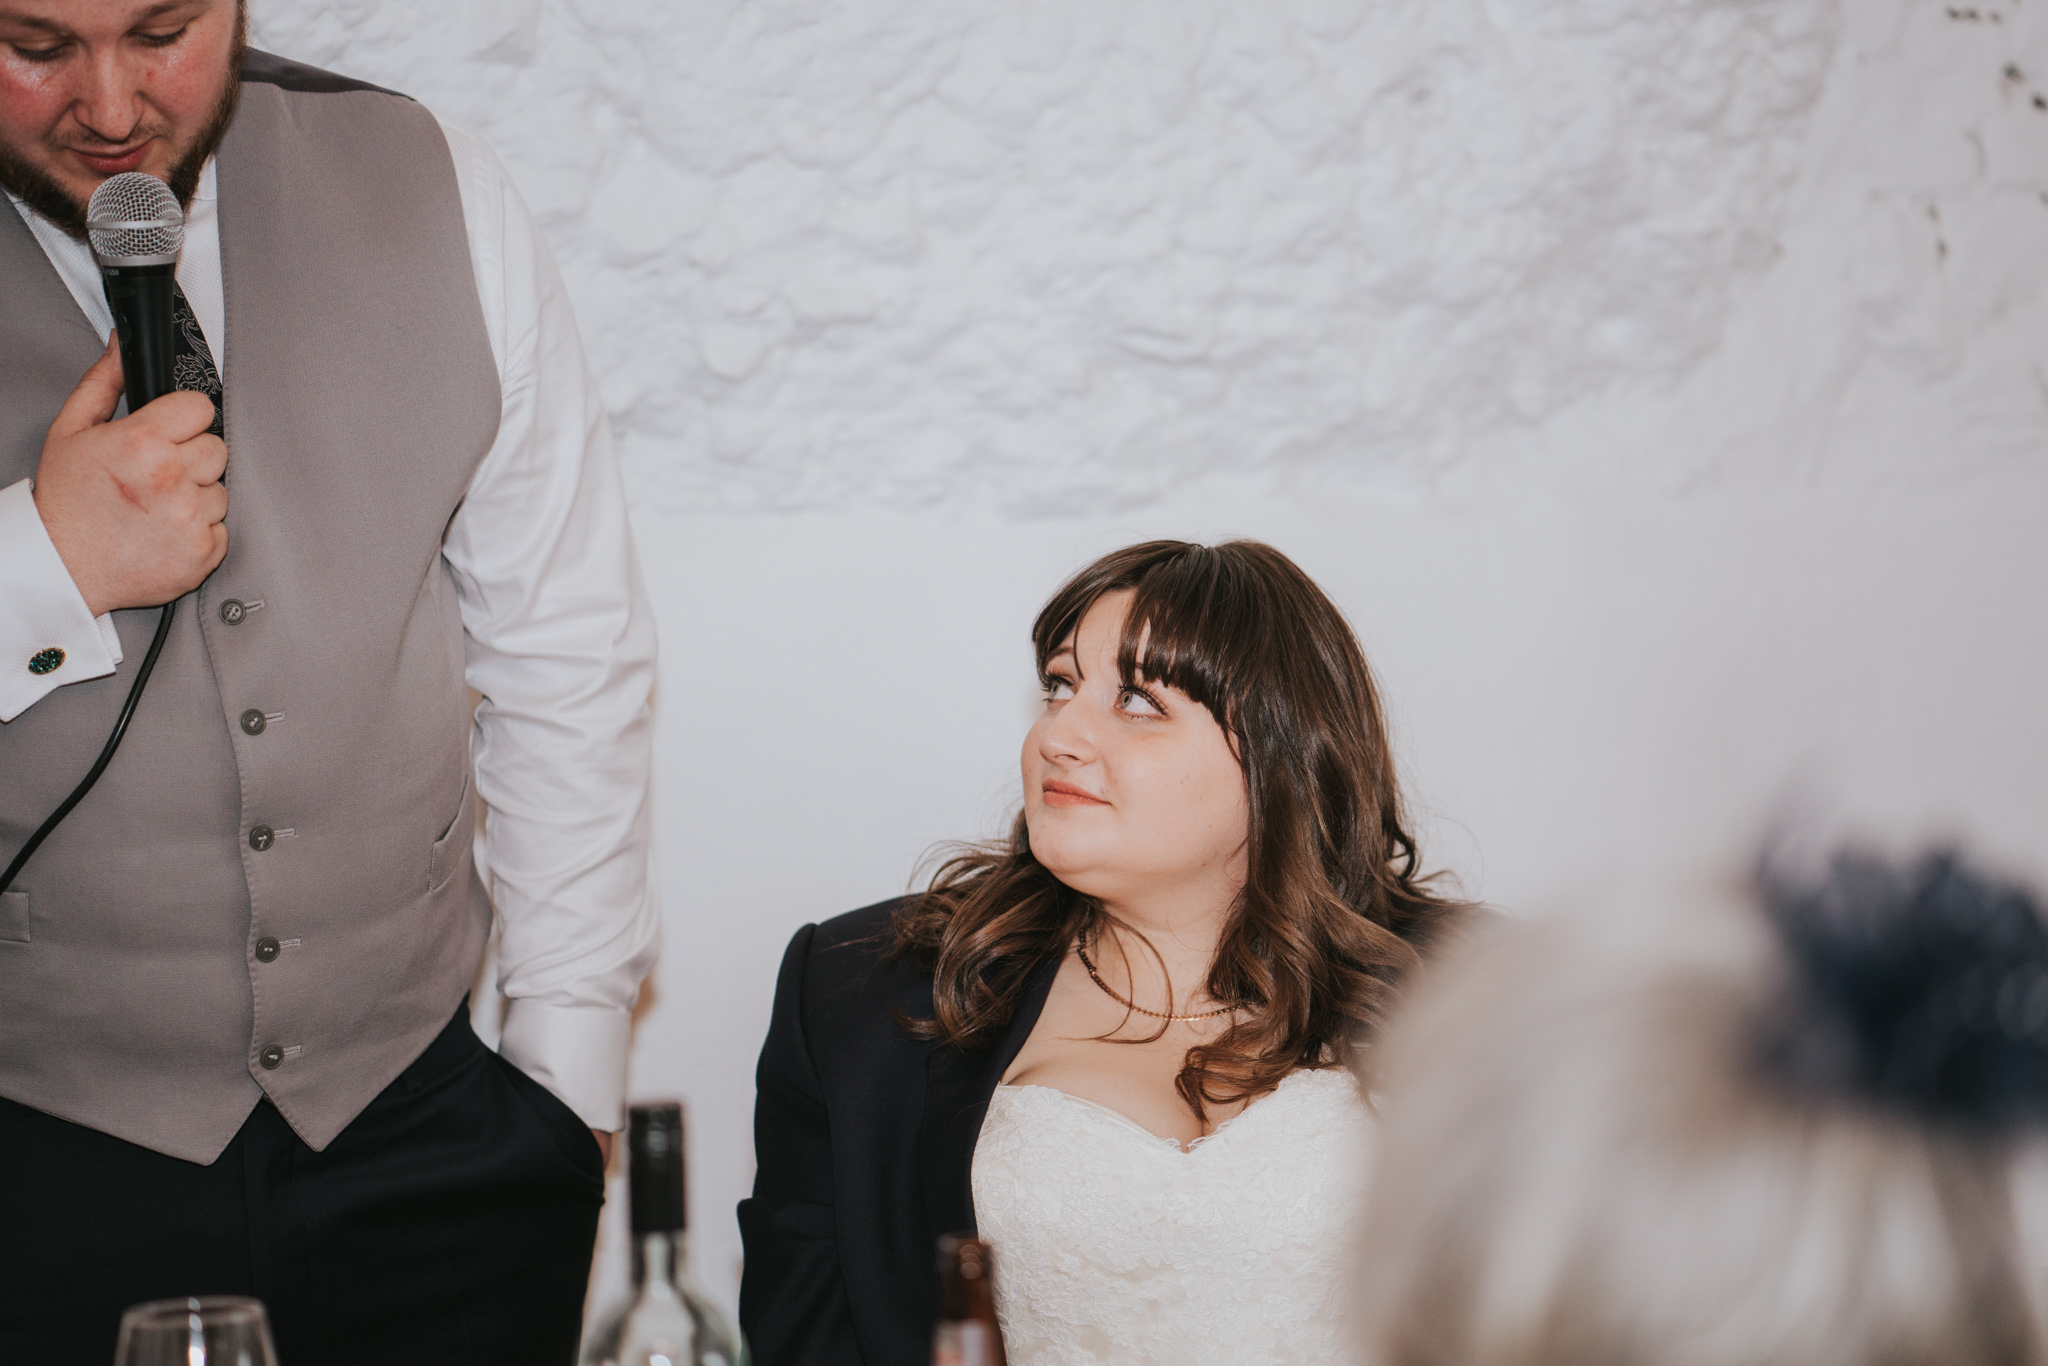 grace-sam-old-barn-clovelly-devon-wedding-photographer-grace-elizabeth-essex-suffolk-norfolk-wedding-photographer (89 of 132).jpg